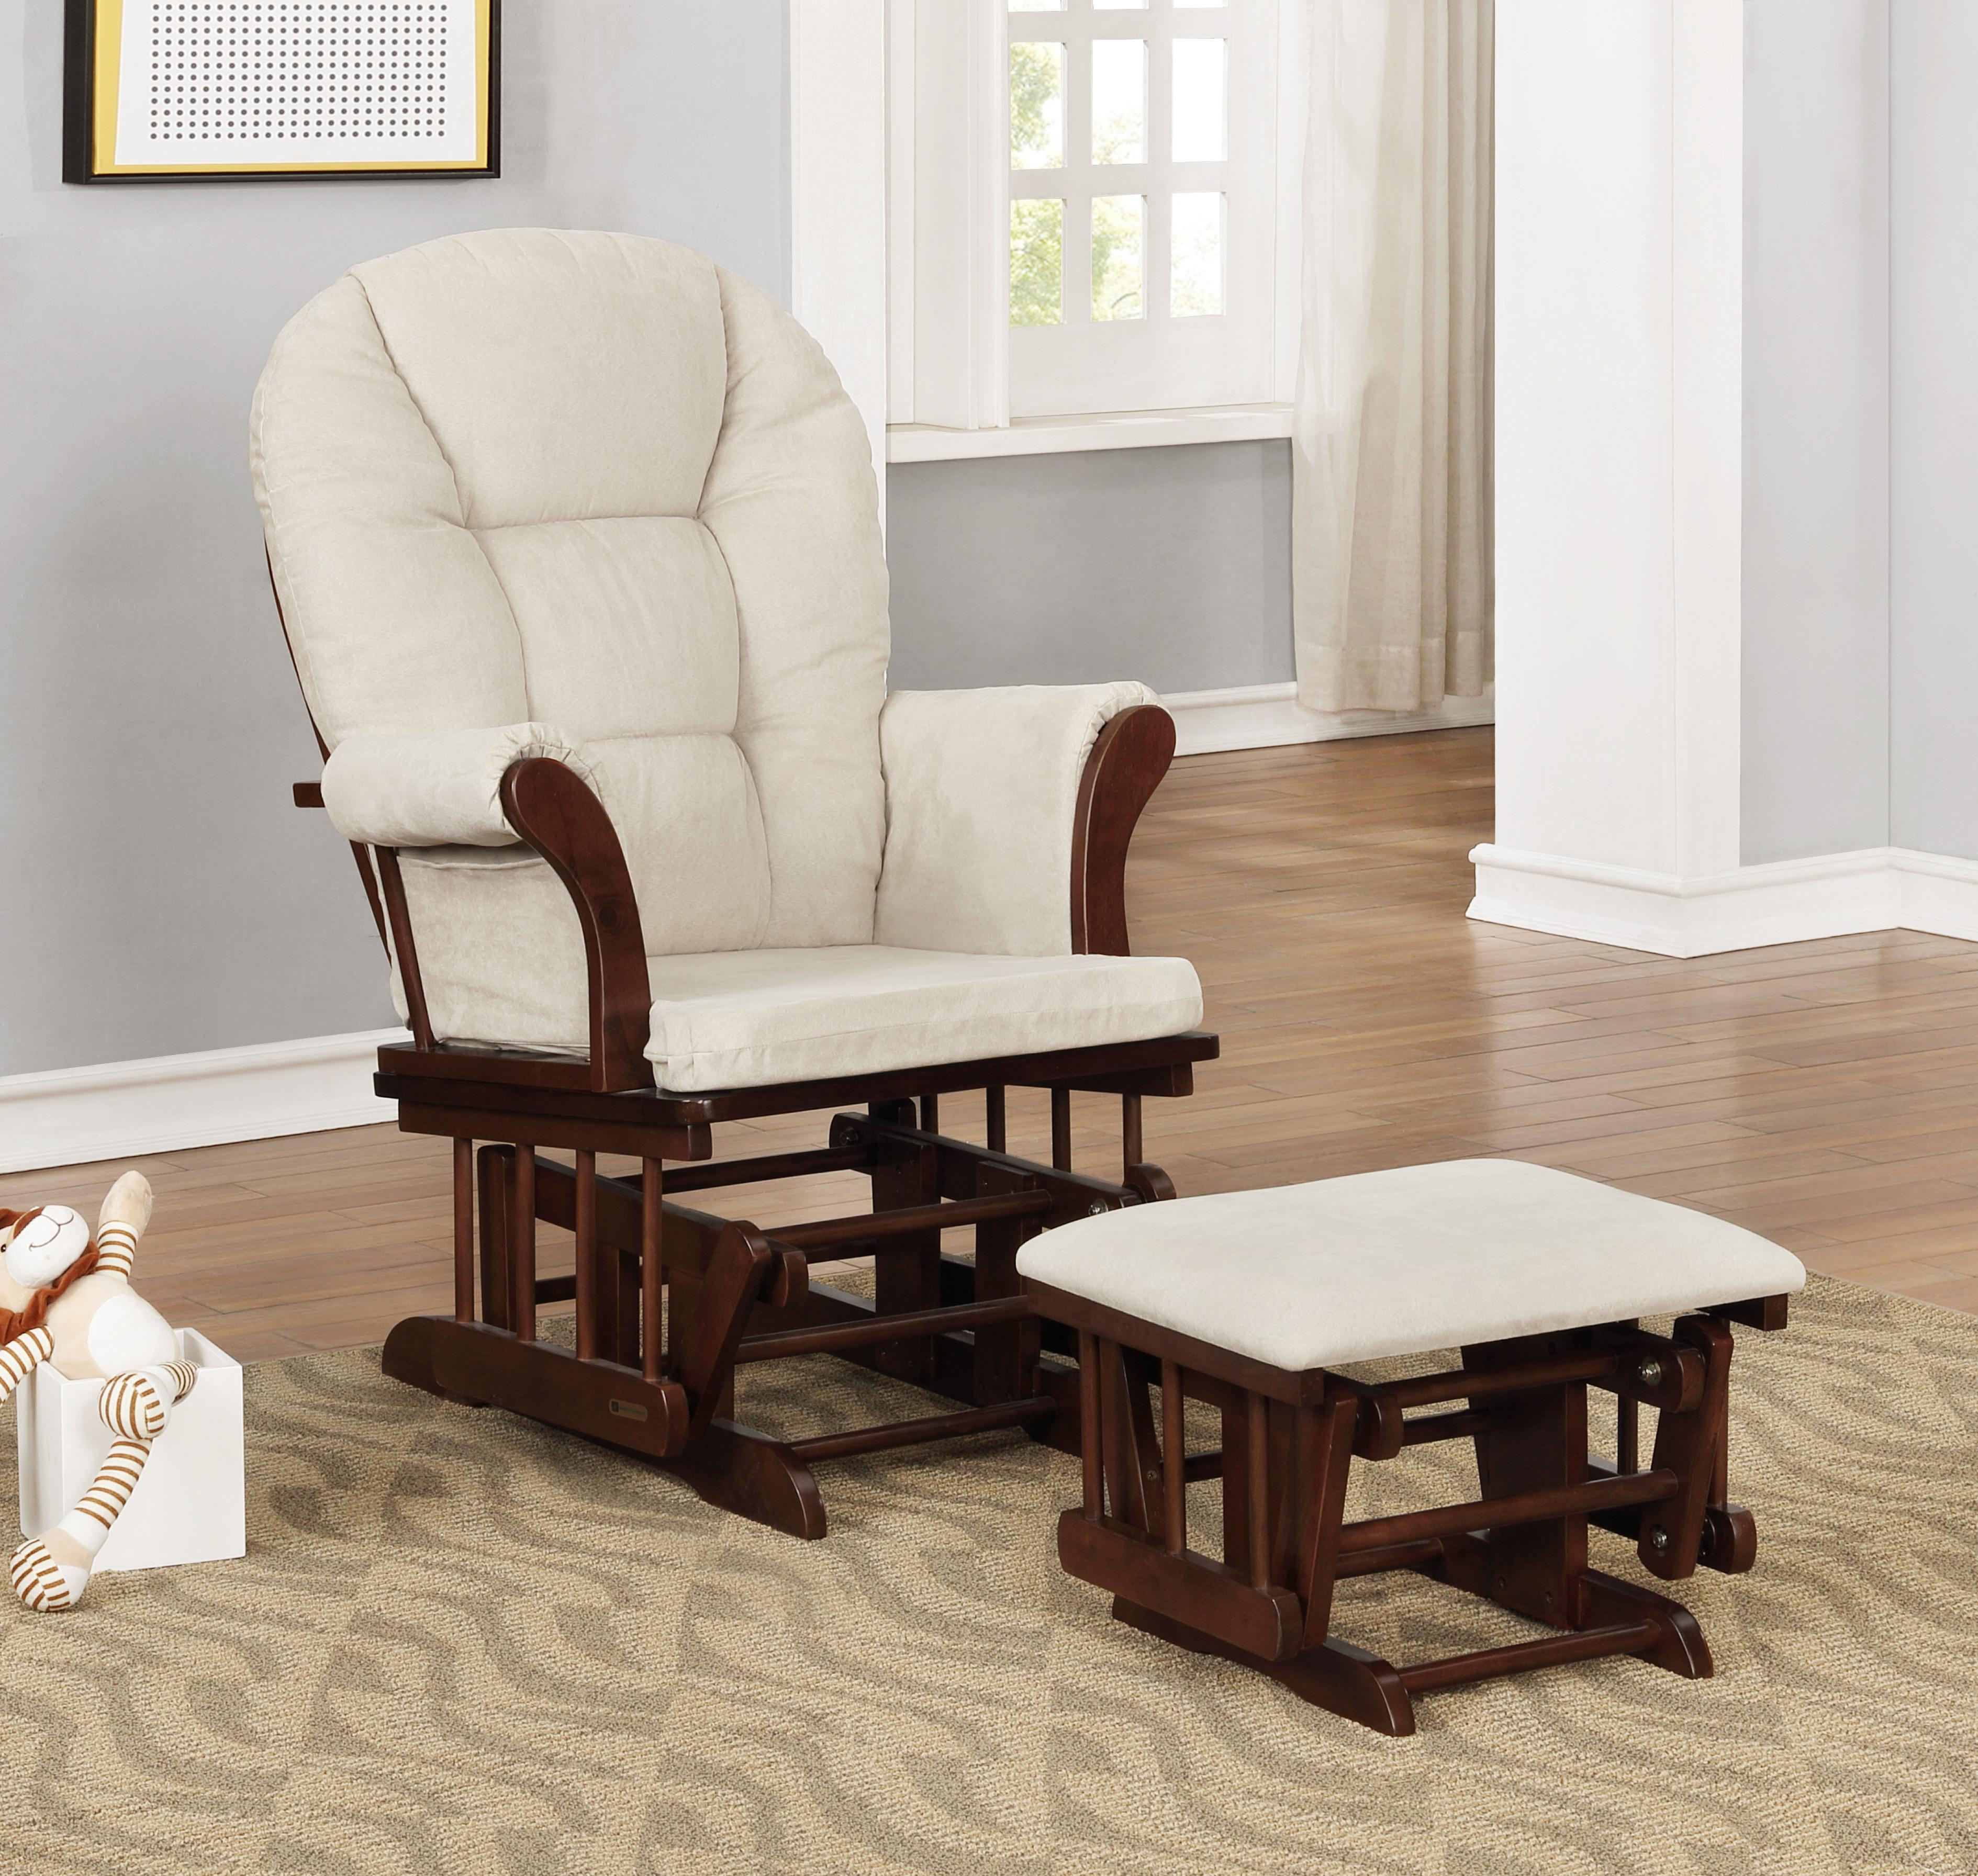 Pleasing Glider Chair And Ottoman Combo Espresso Beige 7083Cb 02 0182 Short Links Chair Design For Home Short Linksinfo